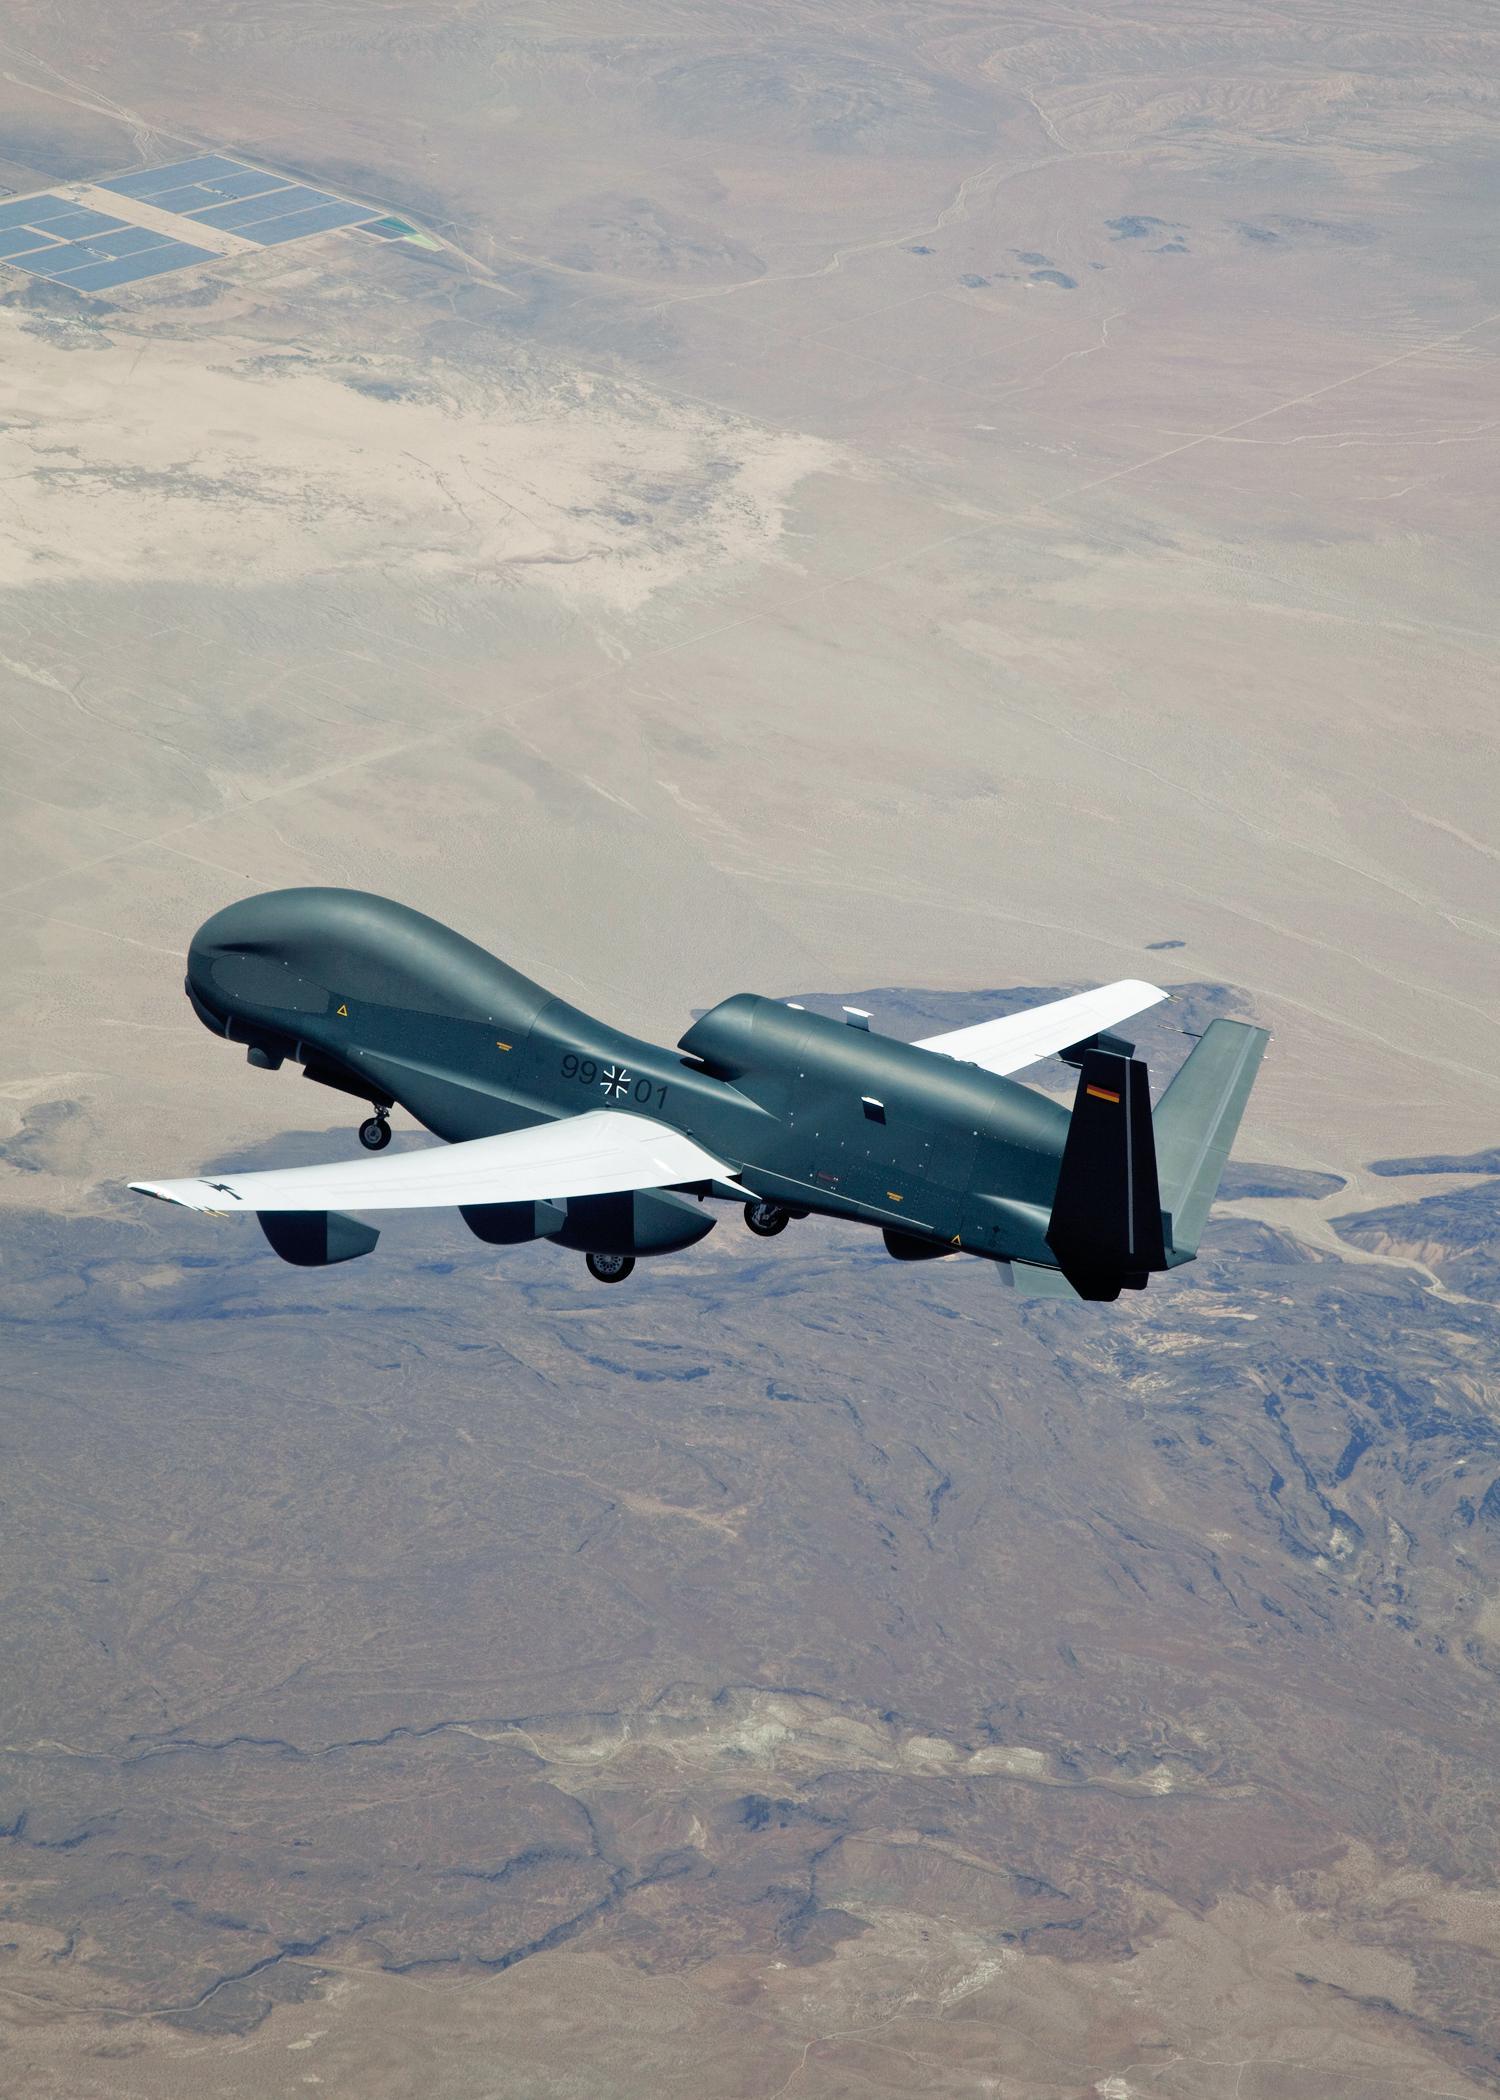 Pakistan Signed Secret 'Protocol' Allowing Drones